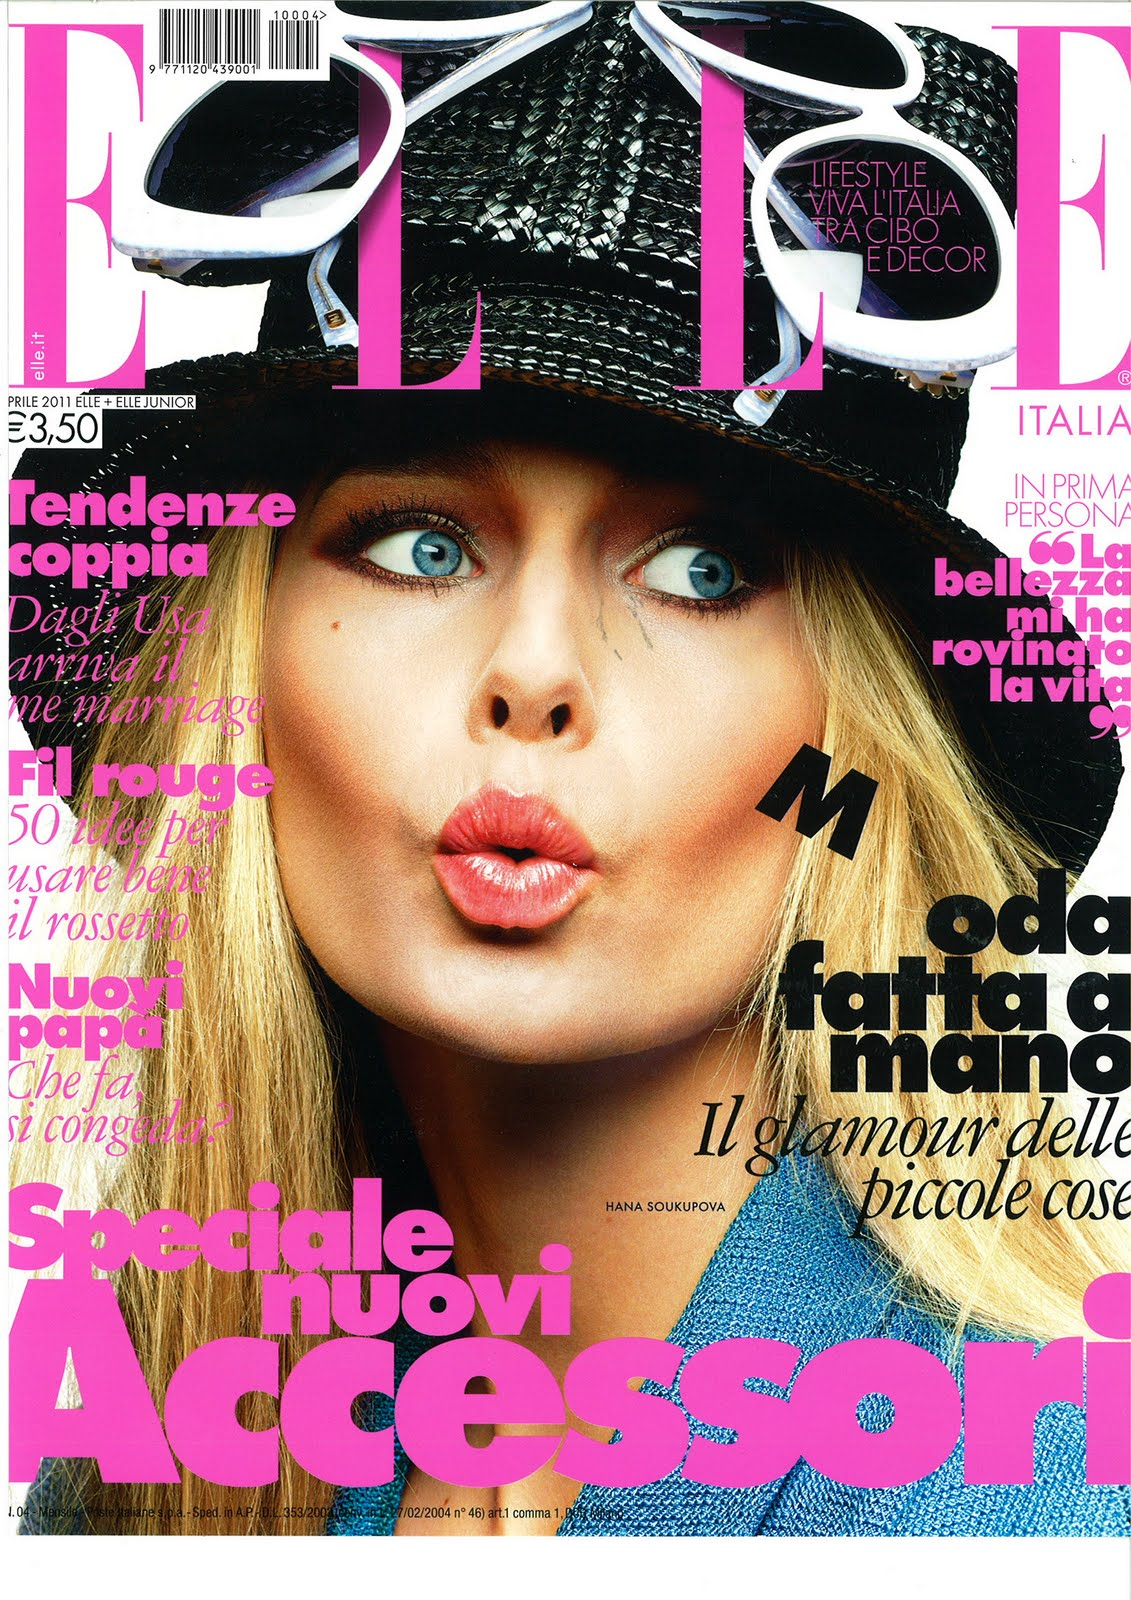 http://3.bp.blogspot.com/-keYINQ2D0B8/Ta2WY7KIhMI/AAAAAAAAAJY/Ibgxcgg8ieE/s1600/11.04+-+Italian+Elle+Cover+Tilda+Swinton+Madam+Gres.jpg